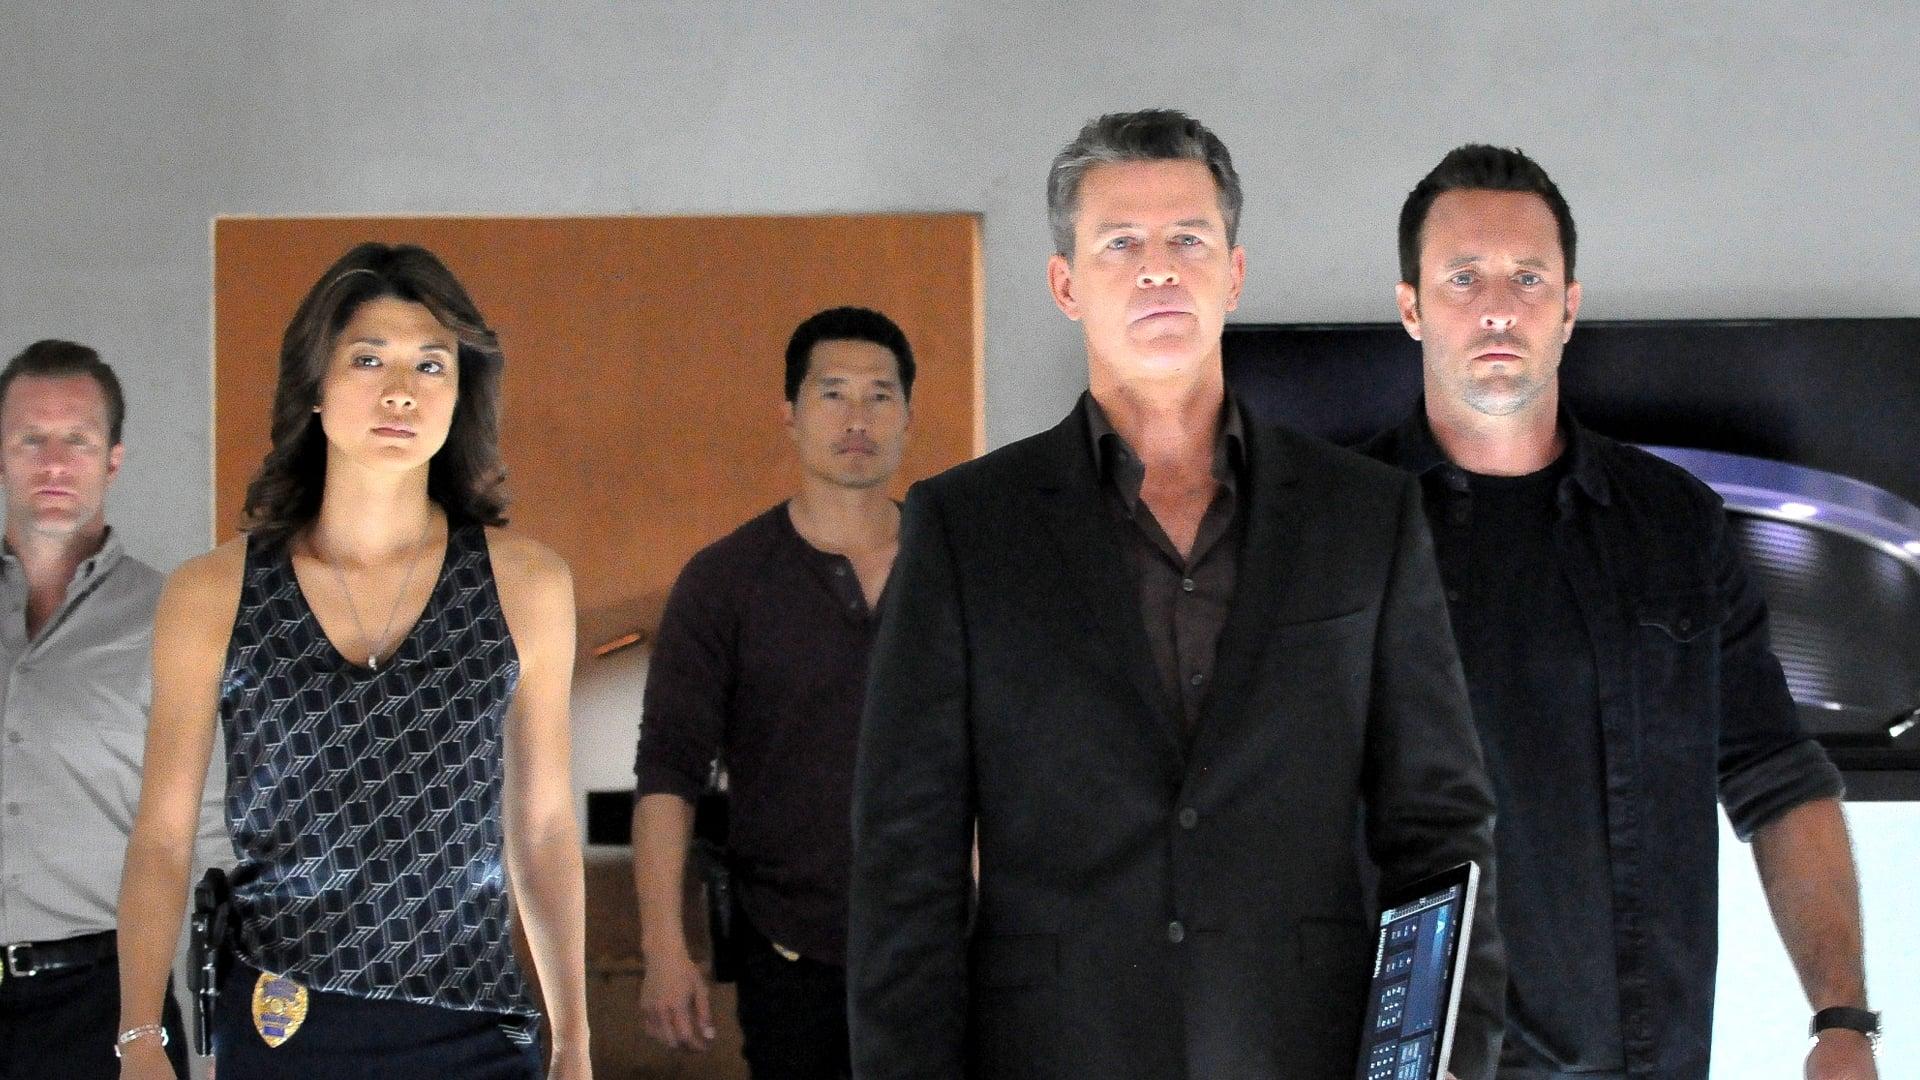 Hawaii Five-0 - Season 6 Episode 20 : Ka Haunaele (Rampage)